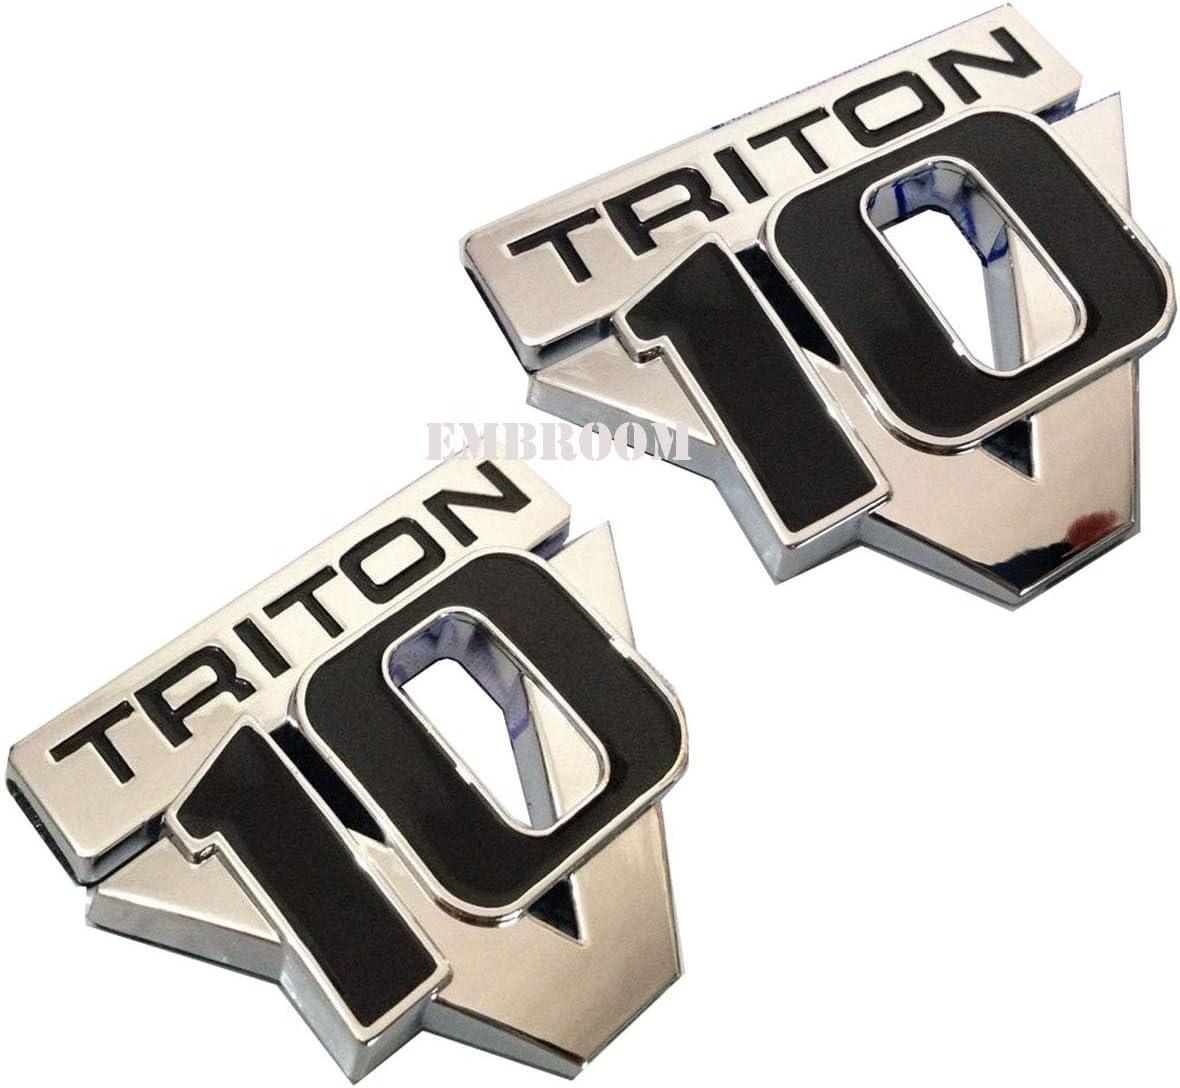 2pcs V10 Triton Emblems, Decals Stickers Replacement Emblem for Ford F Series Trucks (Chrome Black)